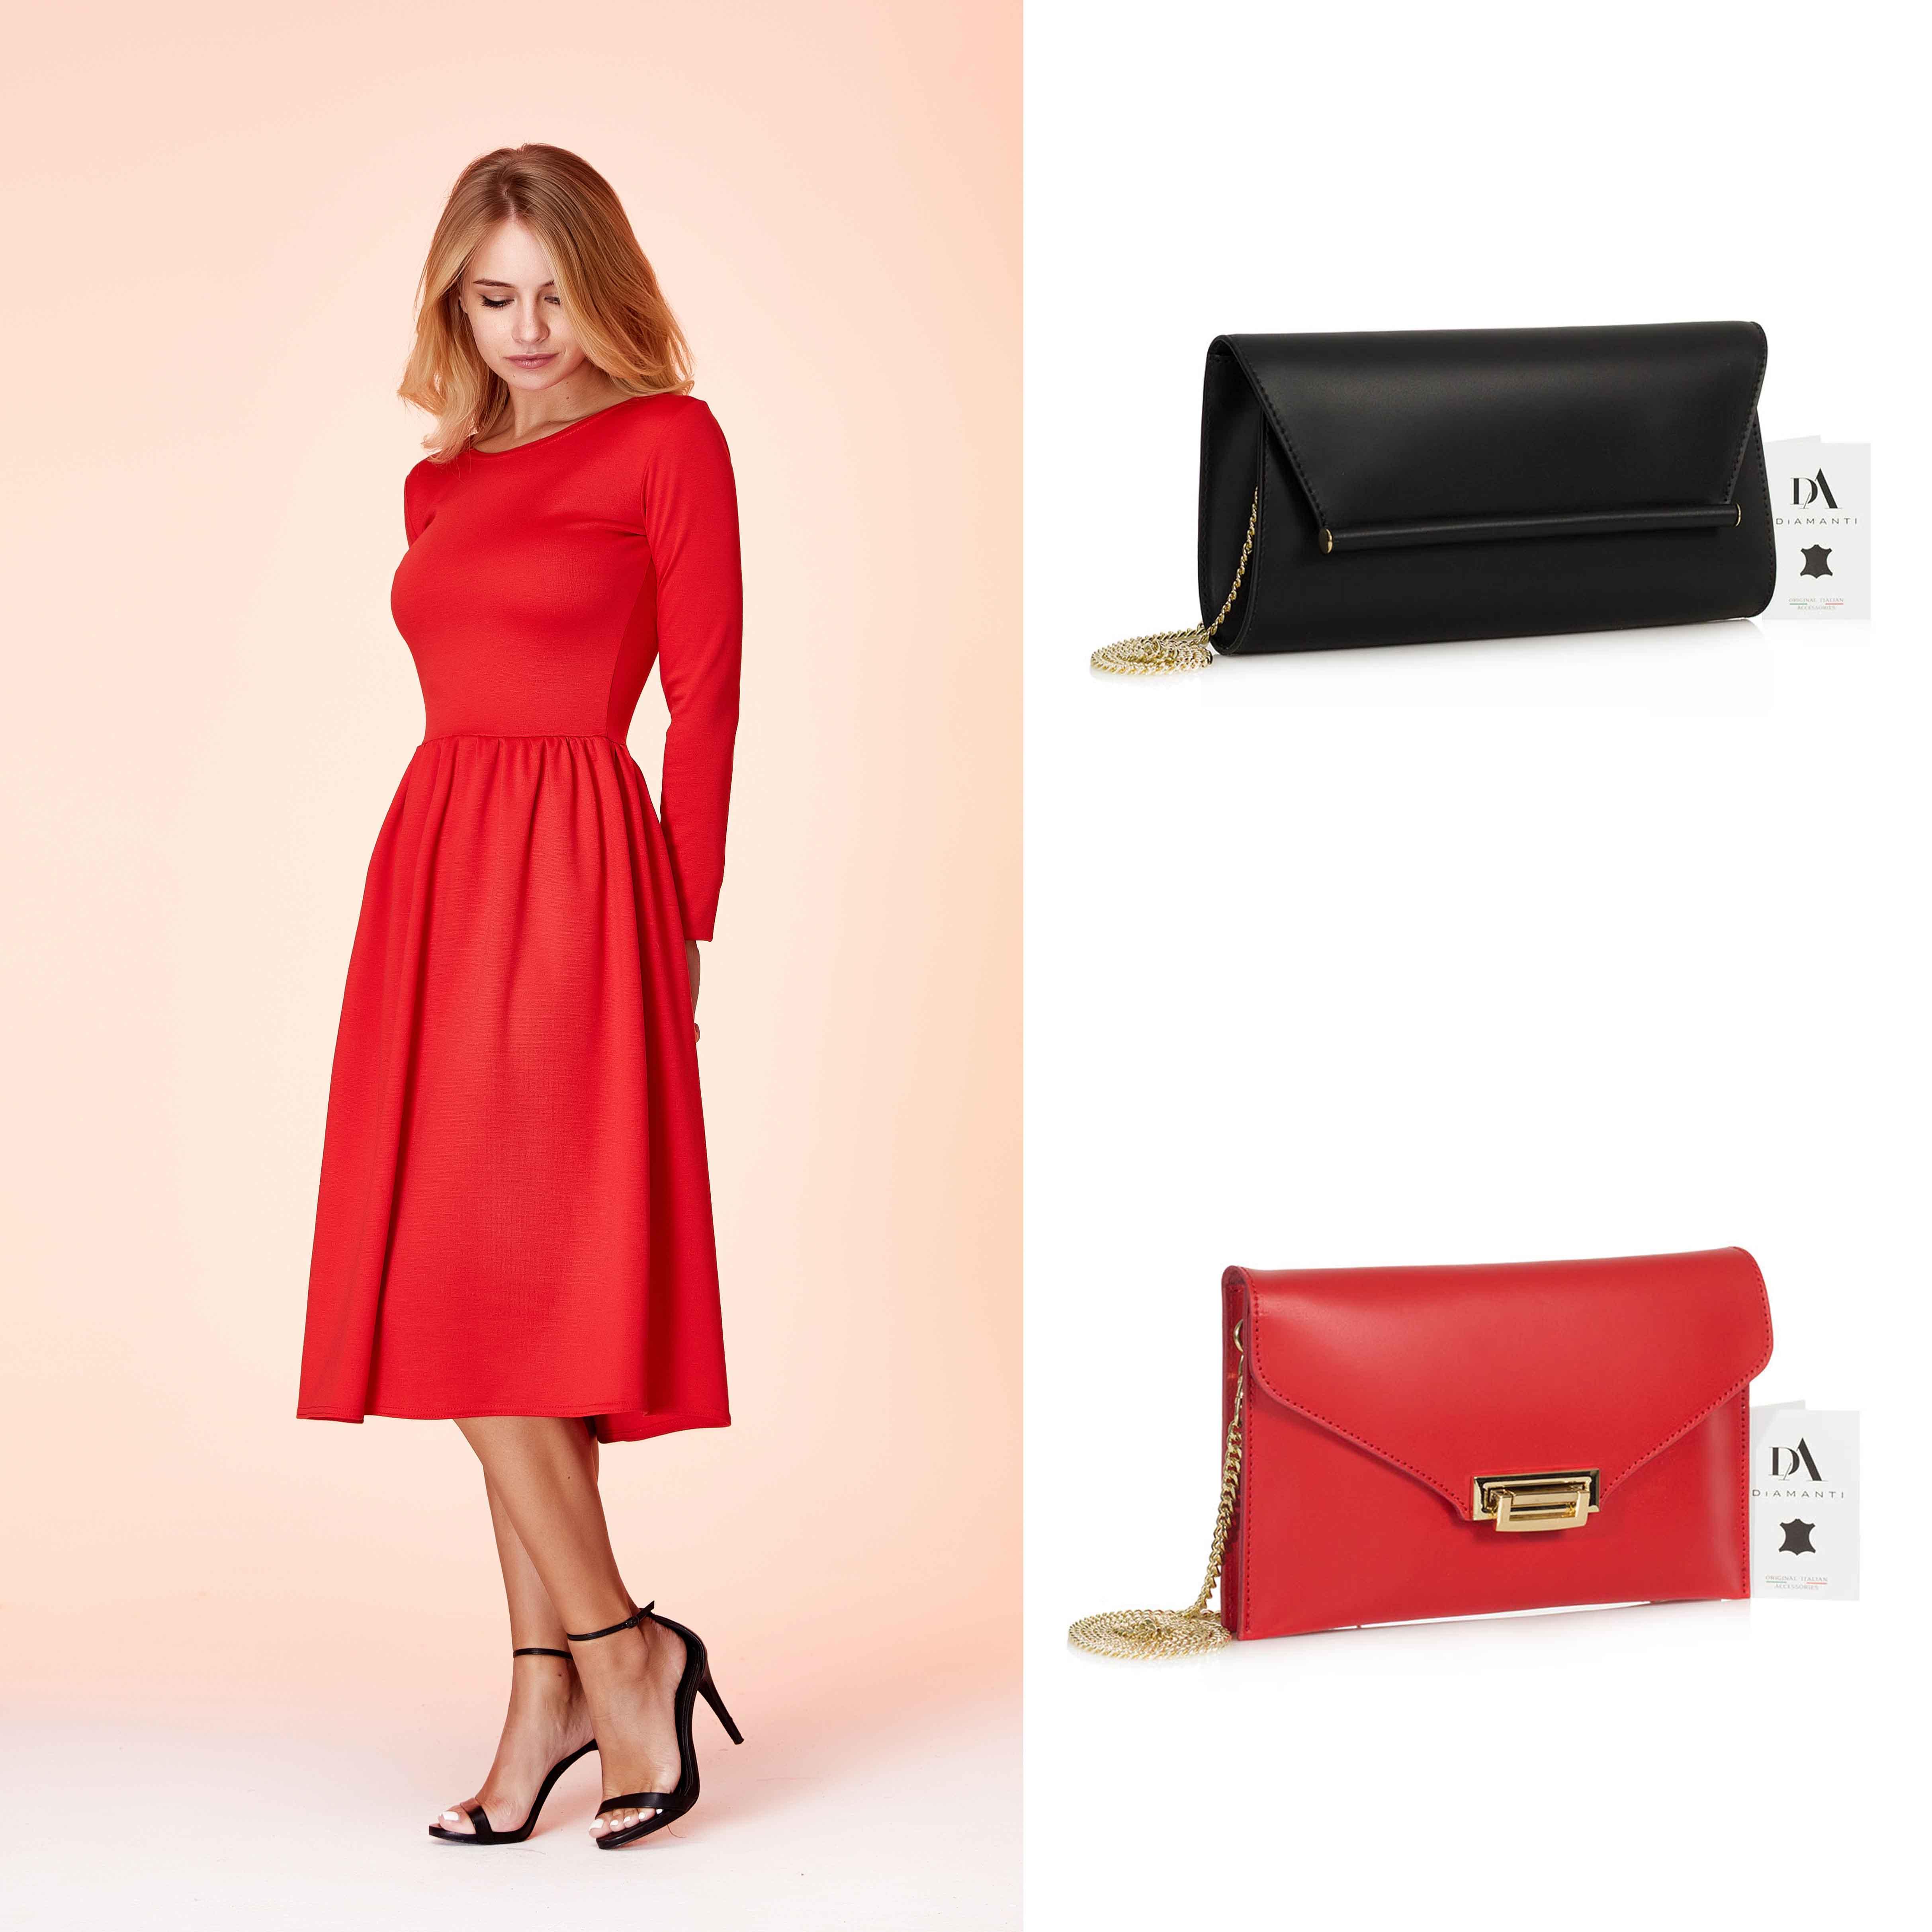 model cu rochie midi rosie, geanta Belladonna si geanta Allegra